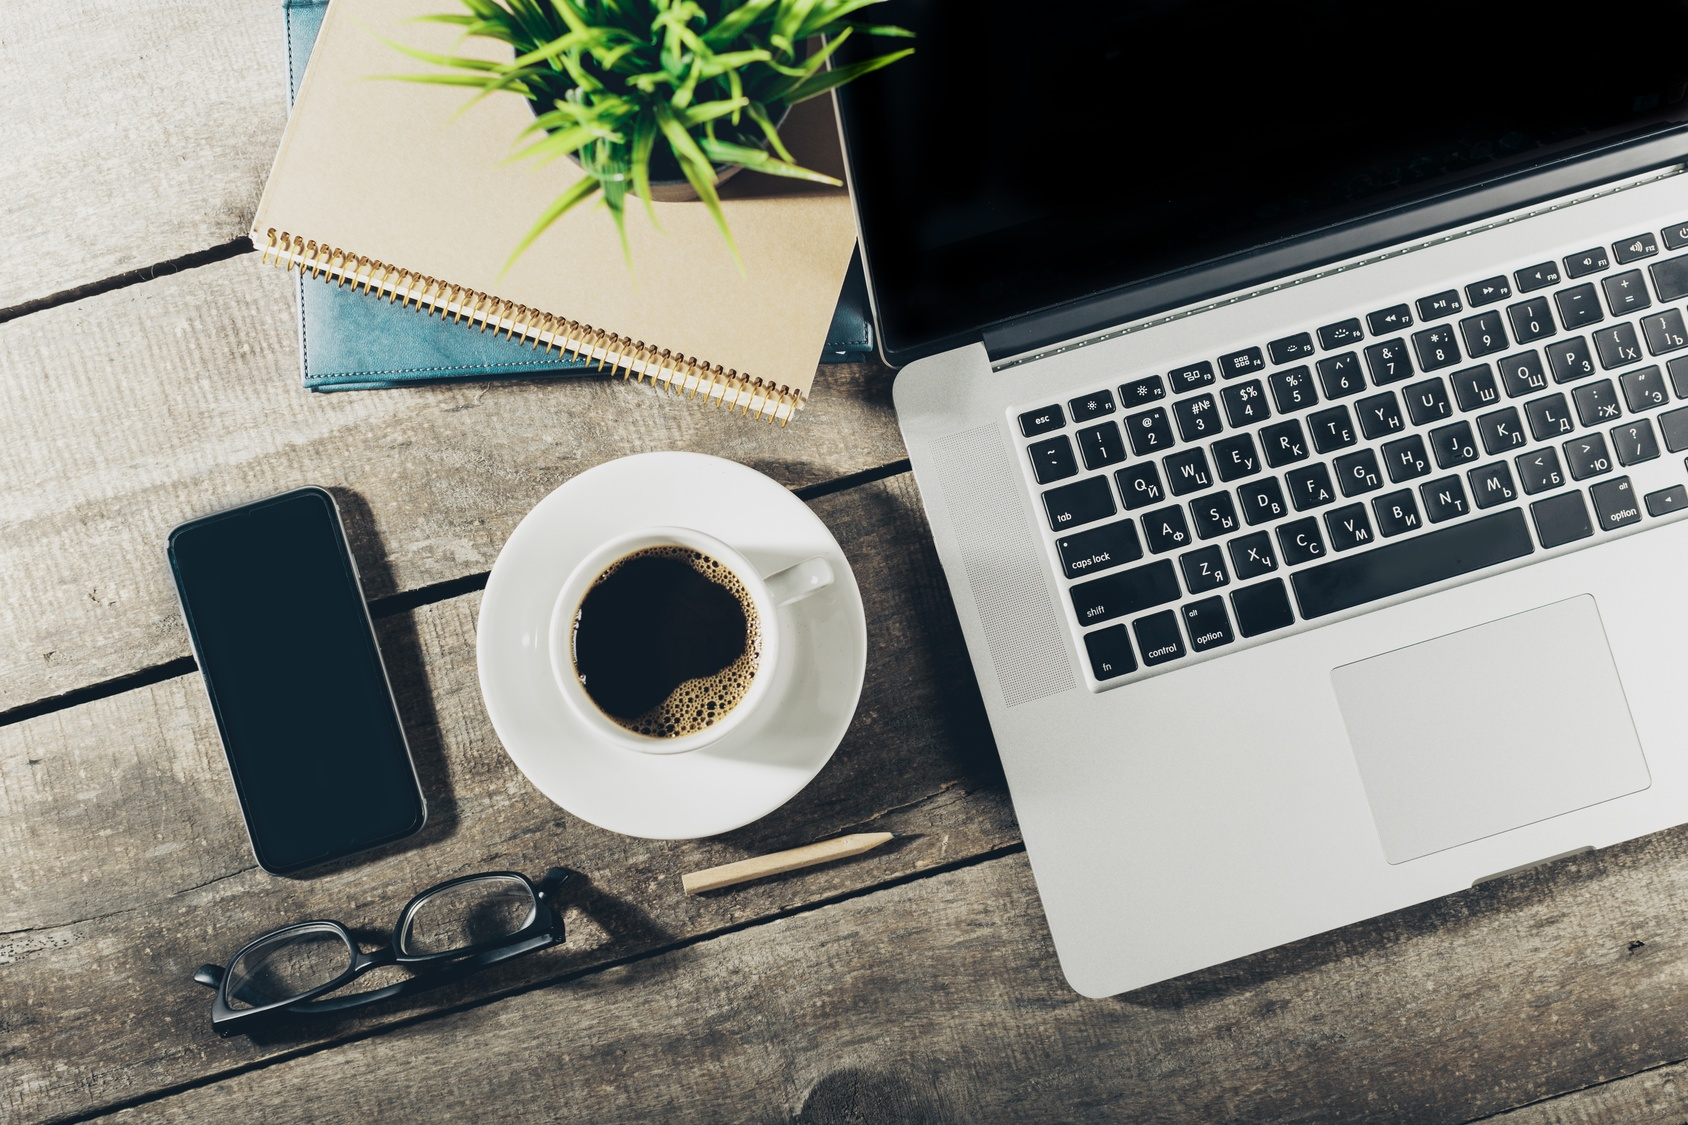 Design Secrets of the Best Web Design Firms